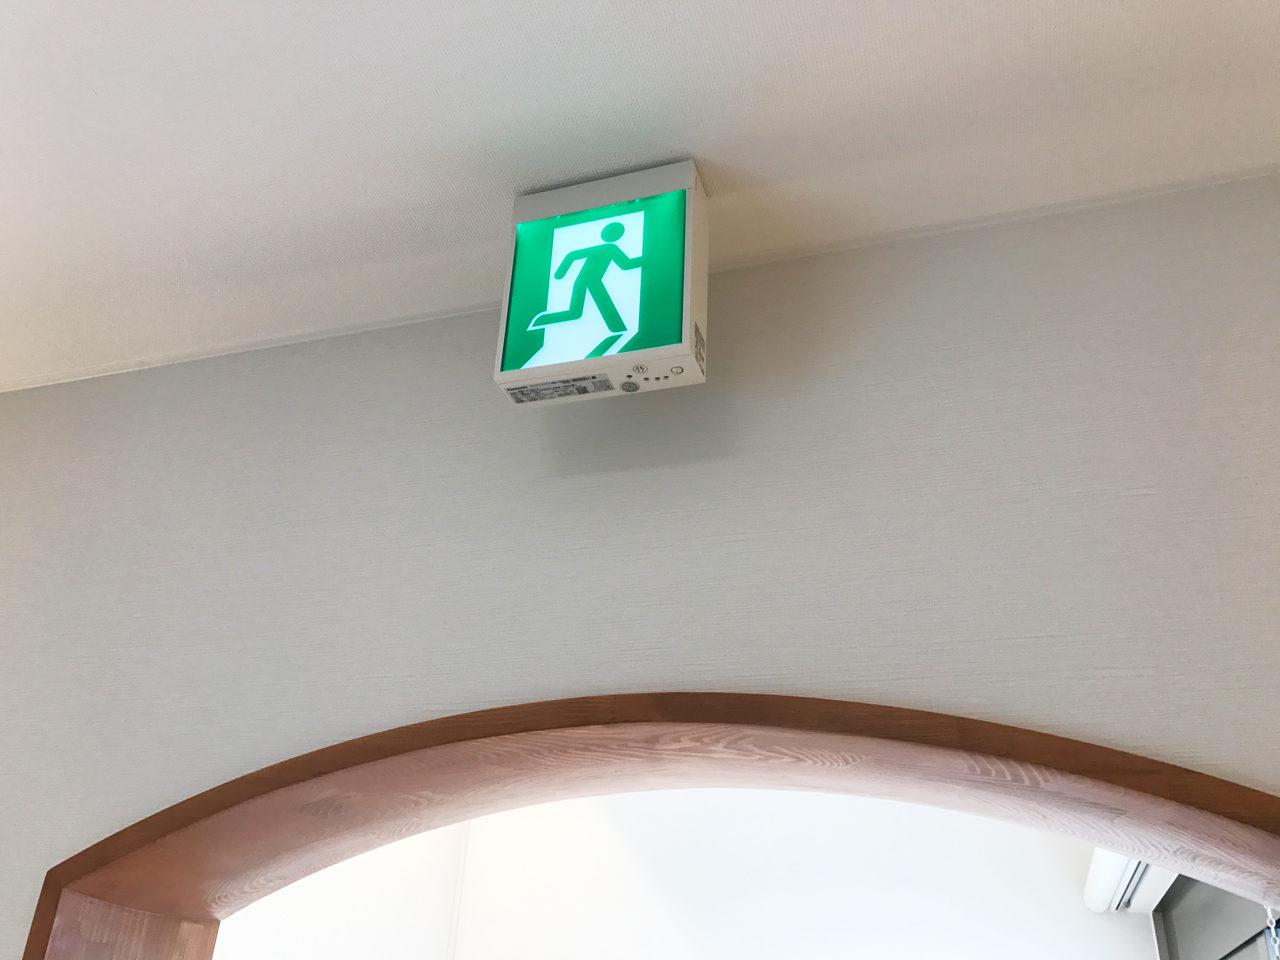 店舗(鍼灸接骨院)付き住宅の誘導灯